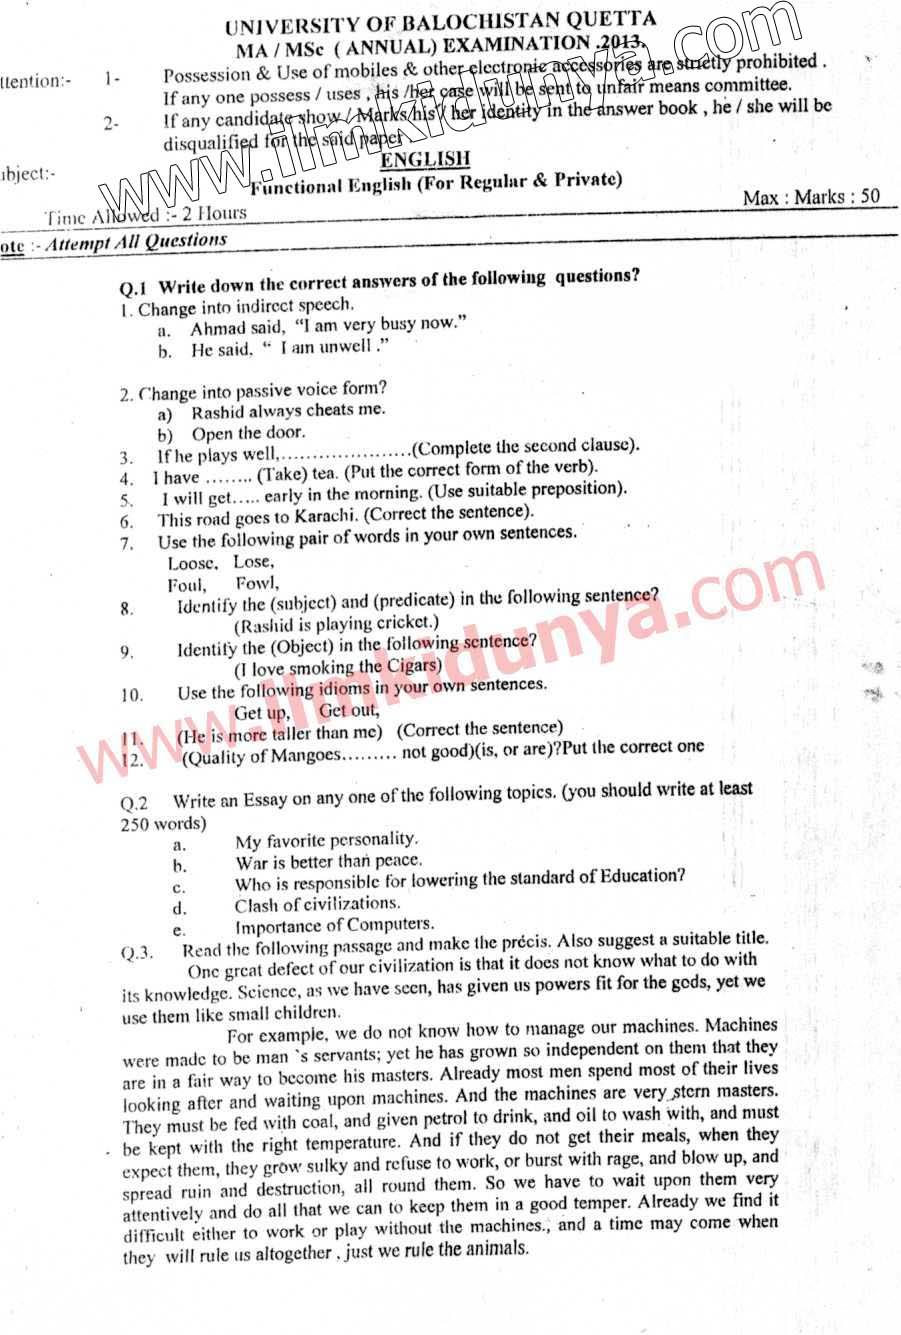 University of Balochistan MA MSc English Past Paper 2013 Romantic